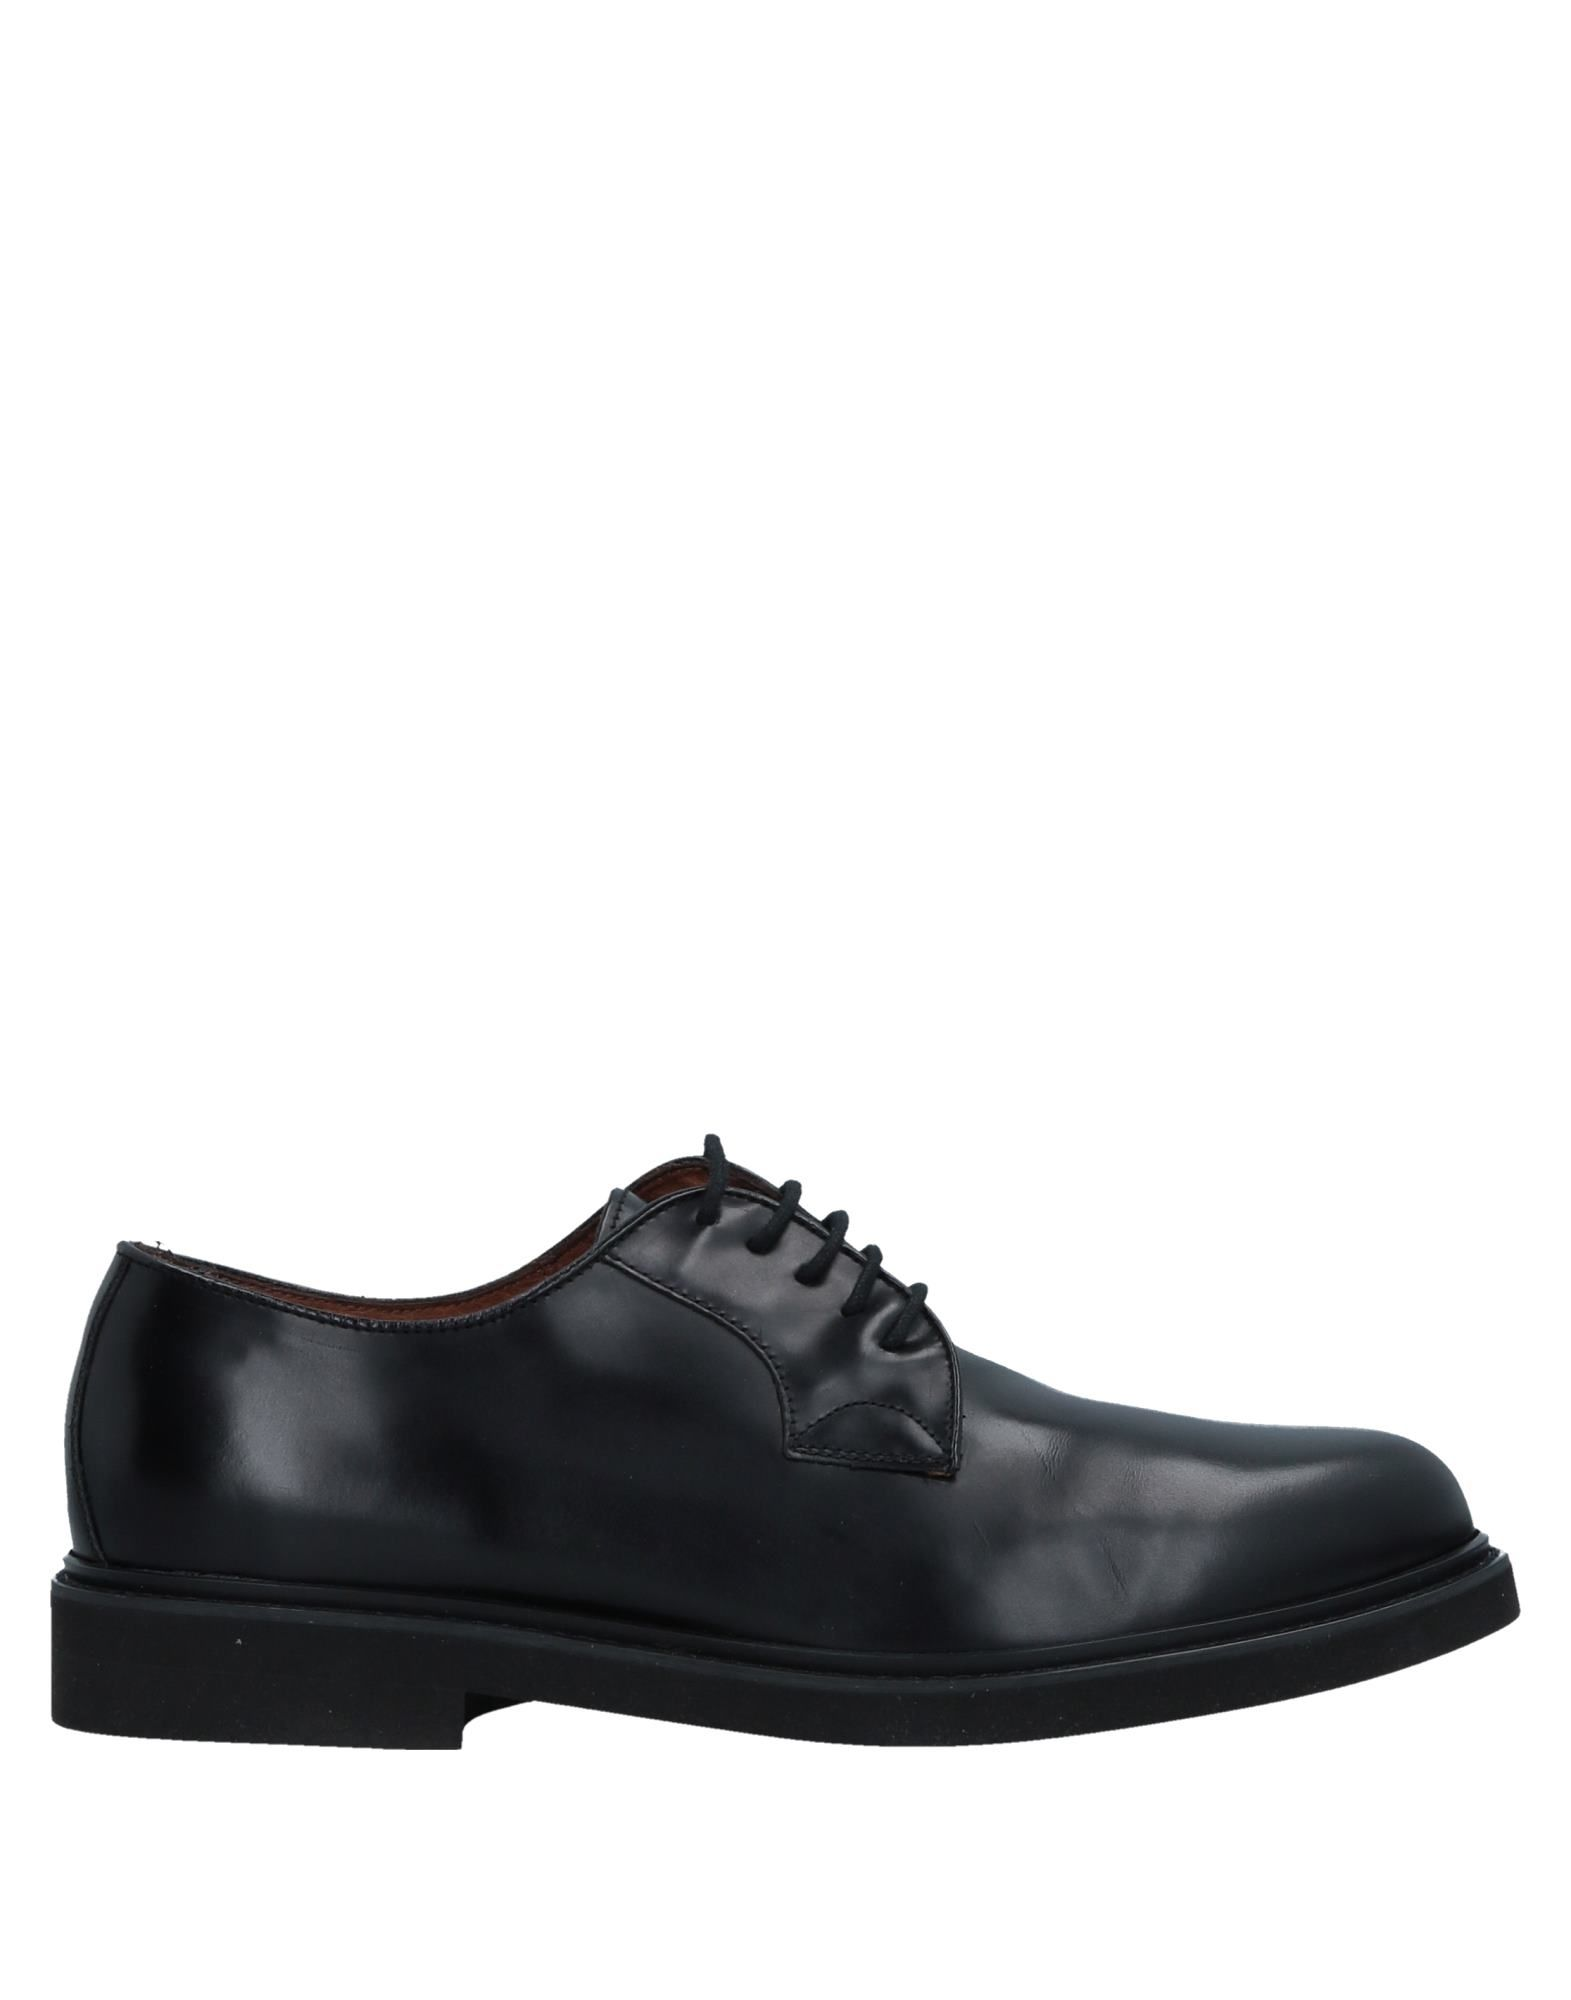 Rabatt echte Schuhe Anderson Schnürschuhe Herren  11520646JJ